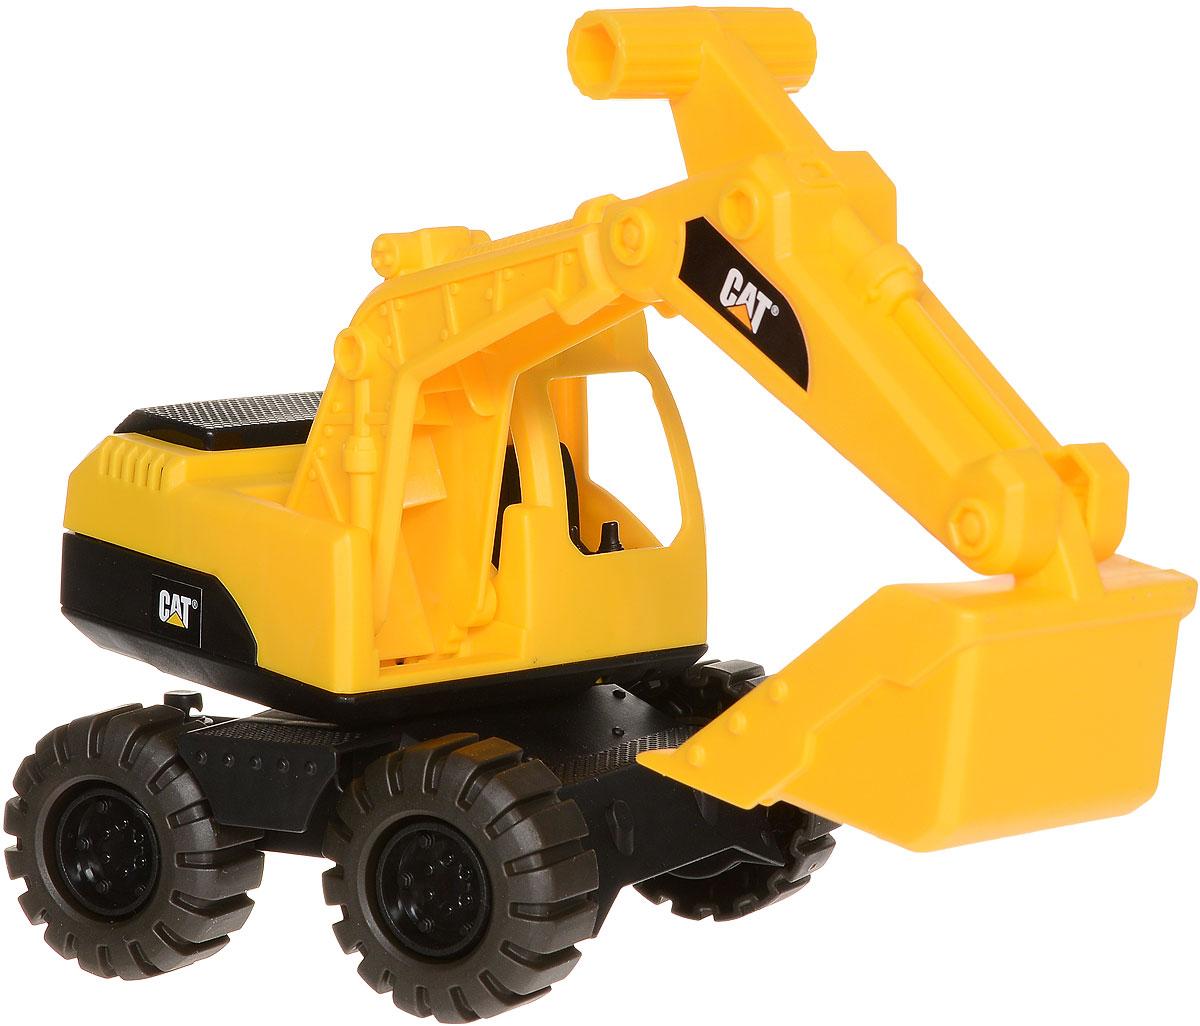 Toystate Экскаватор Cat 82010TS toystate машина со светом и звуком toystate в ассортименте